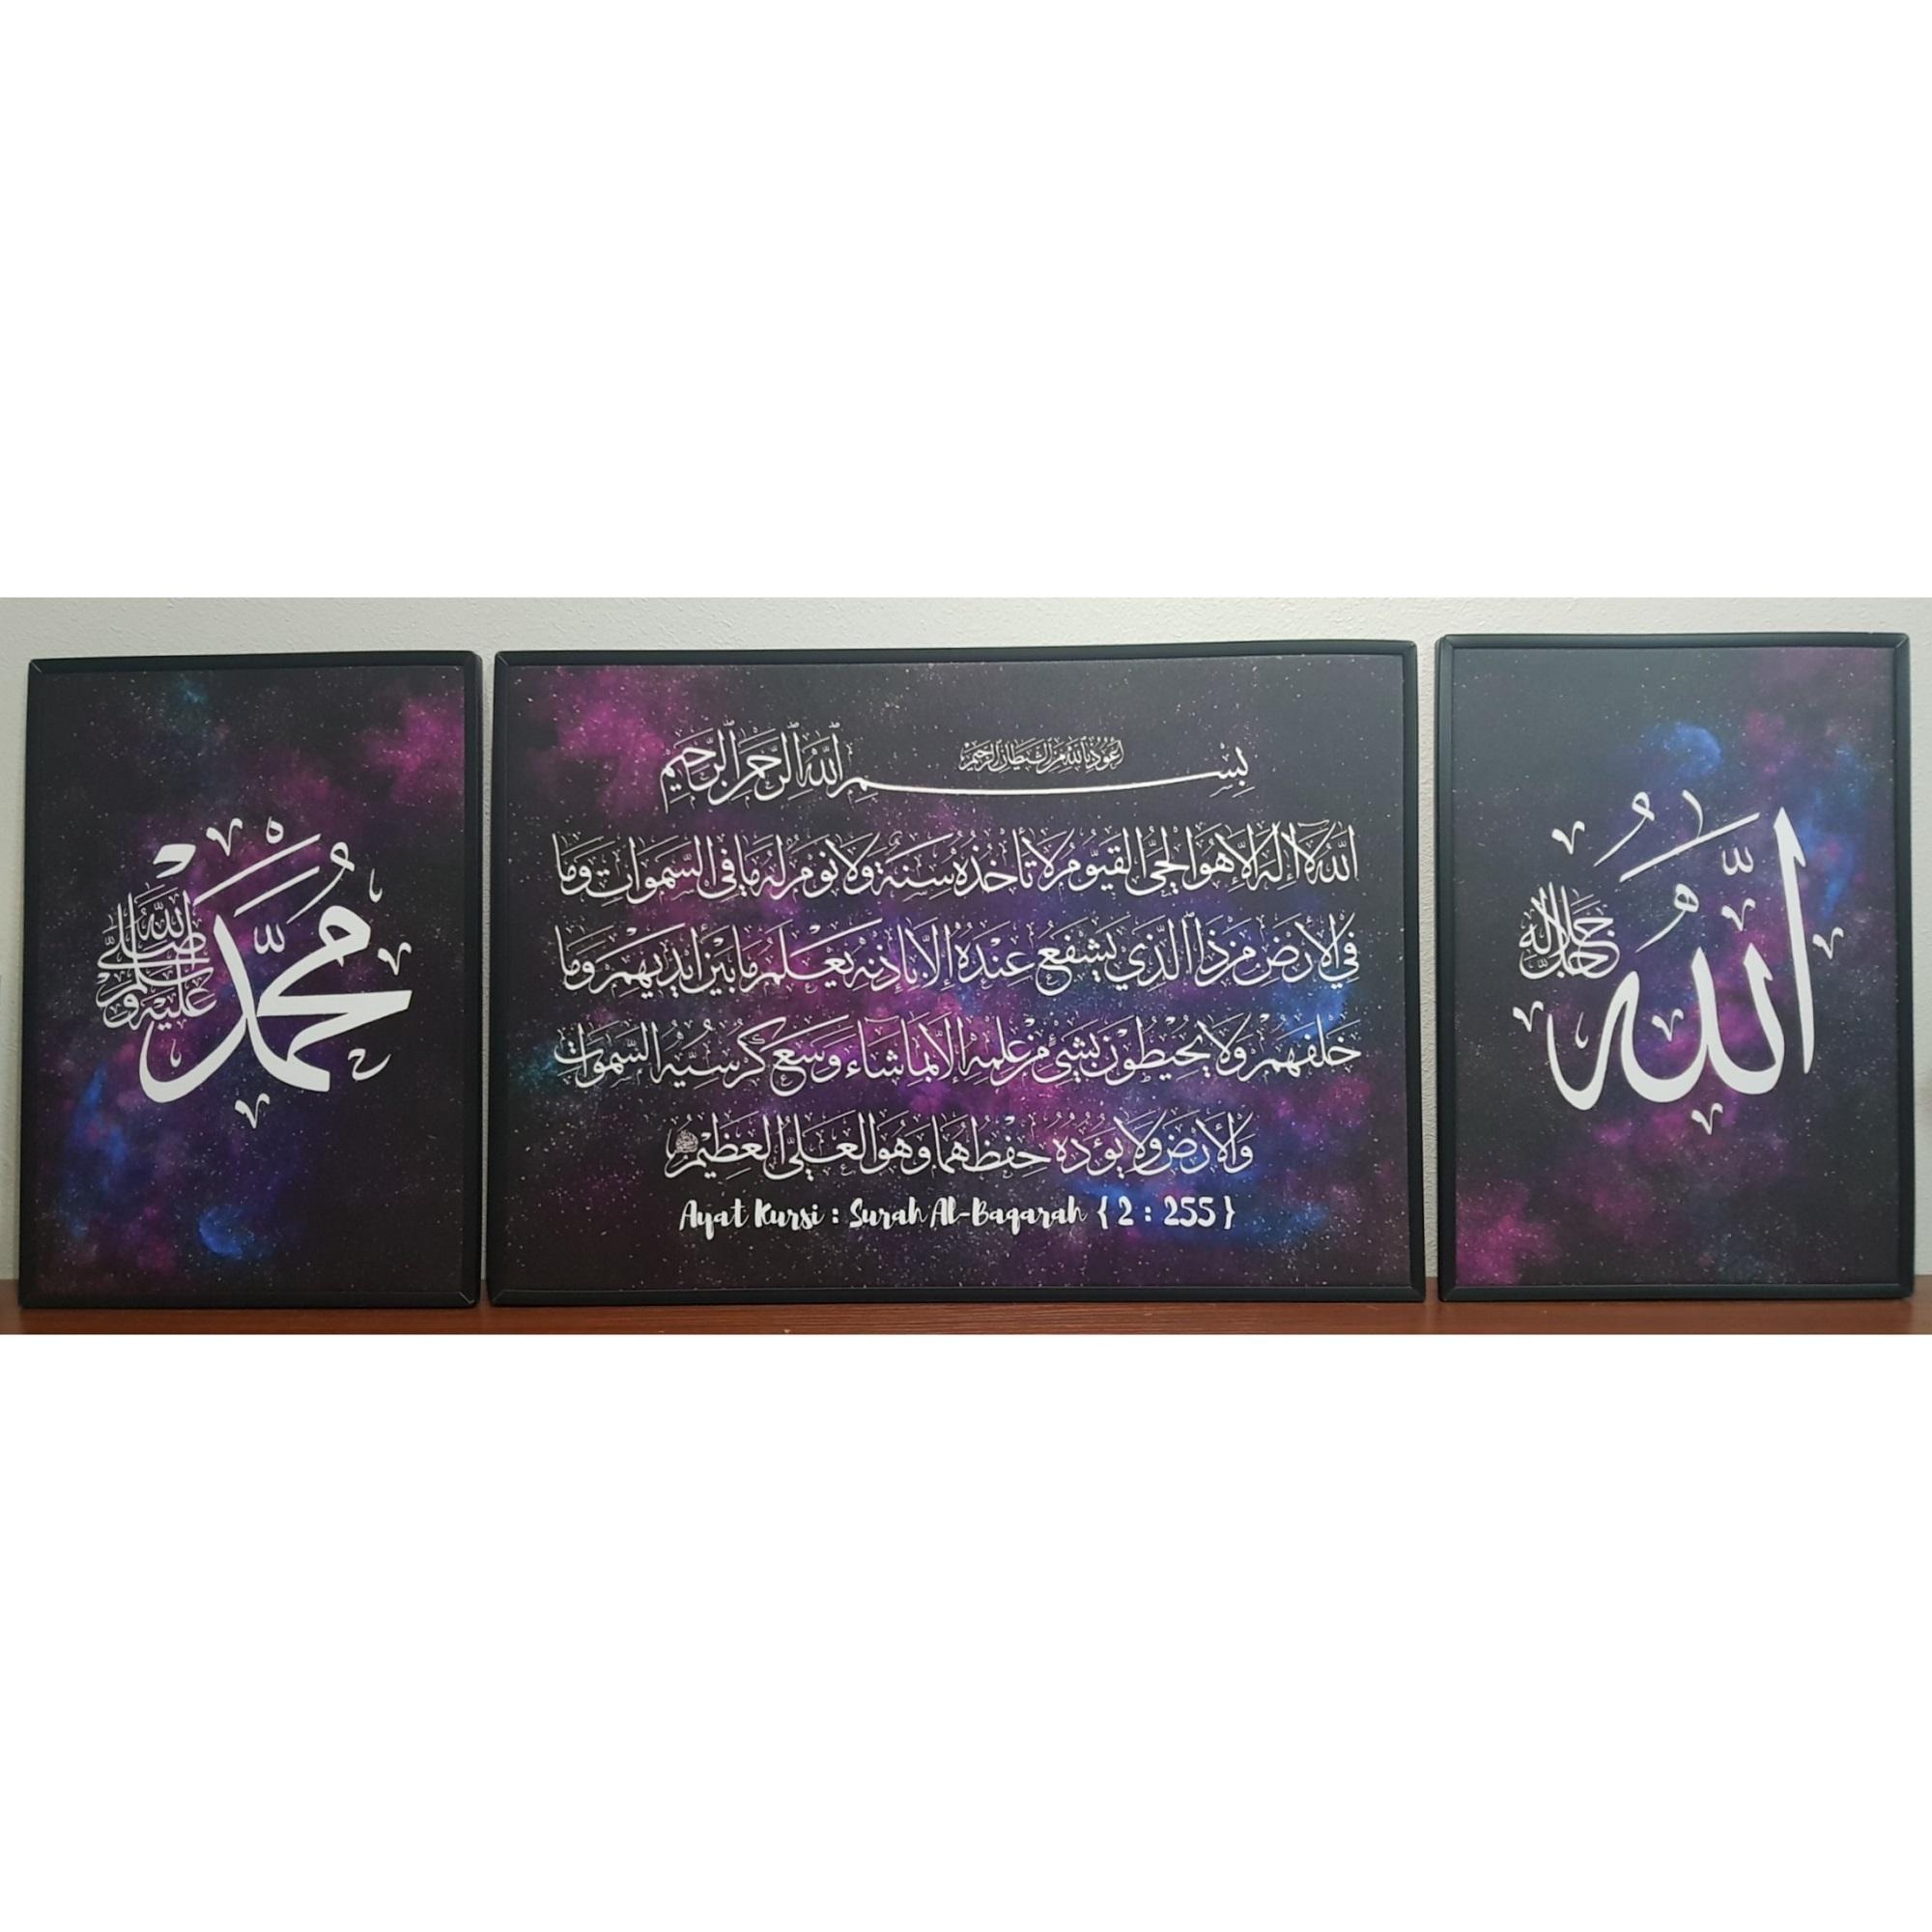 Islamic Calligraphy Ayat Kursi Small Set Framed Wall Decor - Modern Nordic Scandinavian Inspired